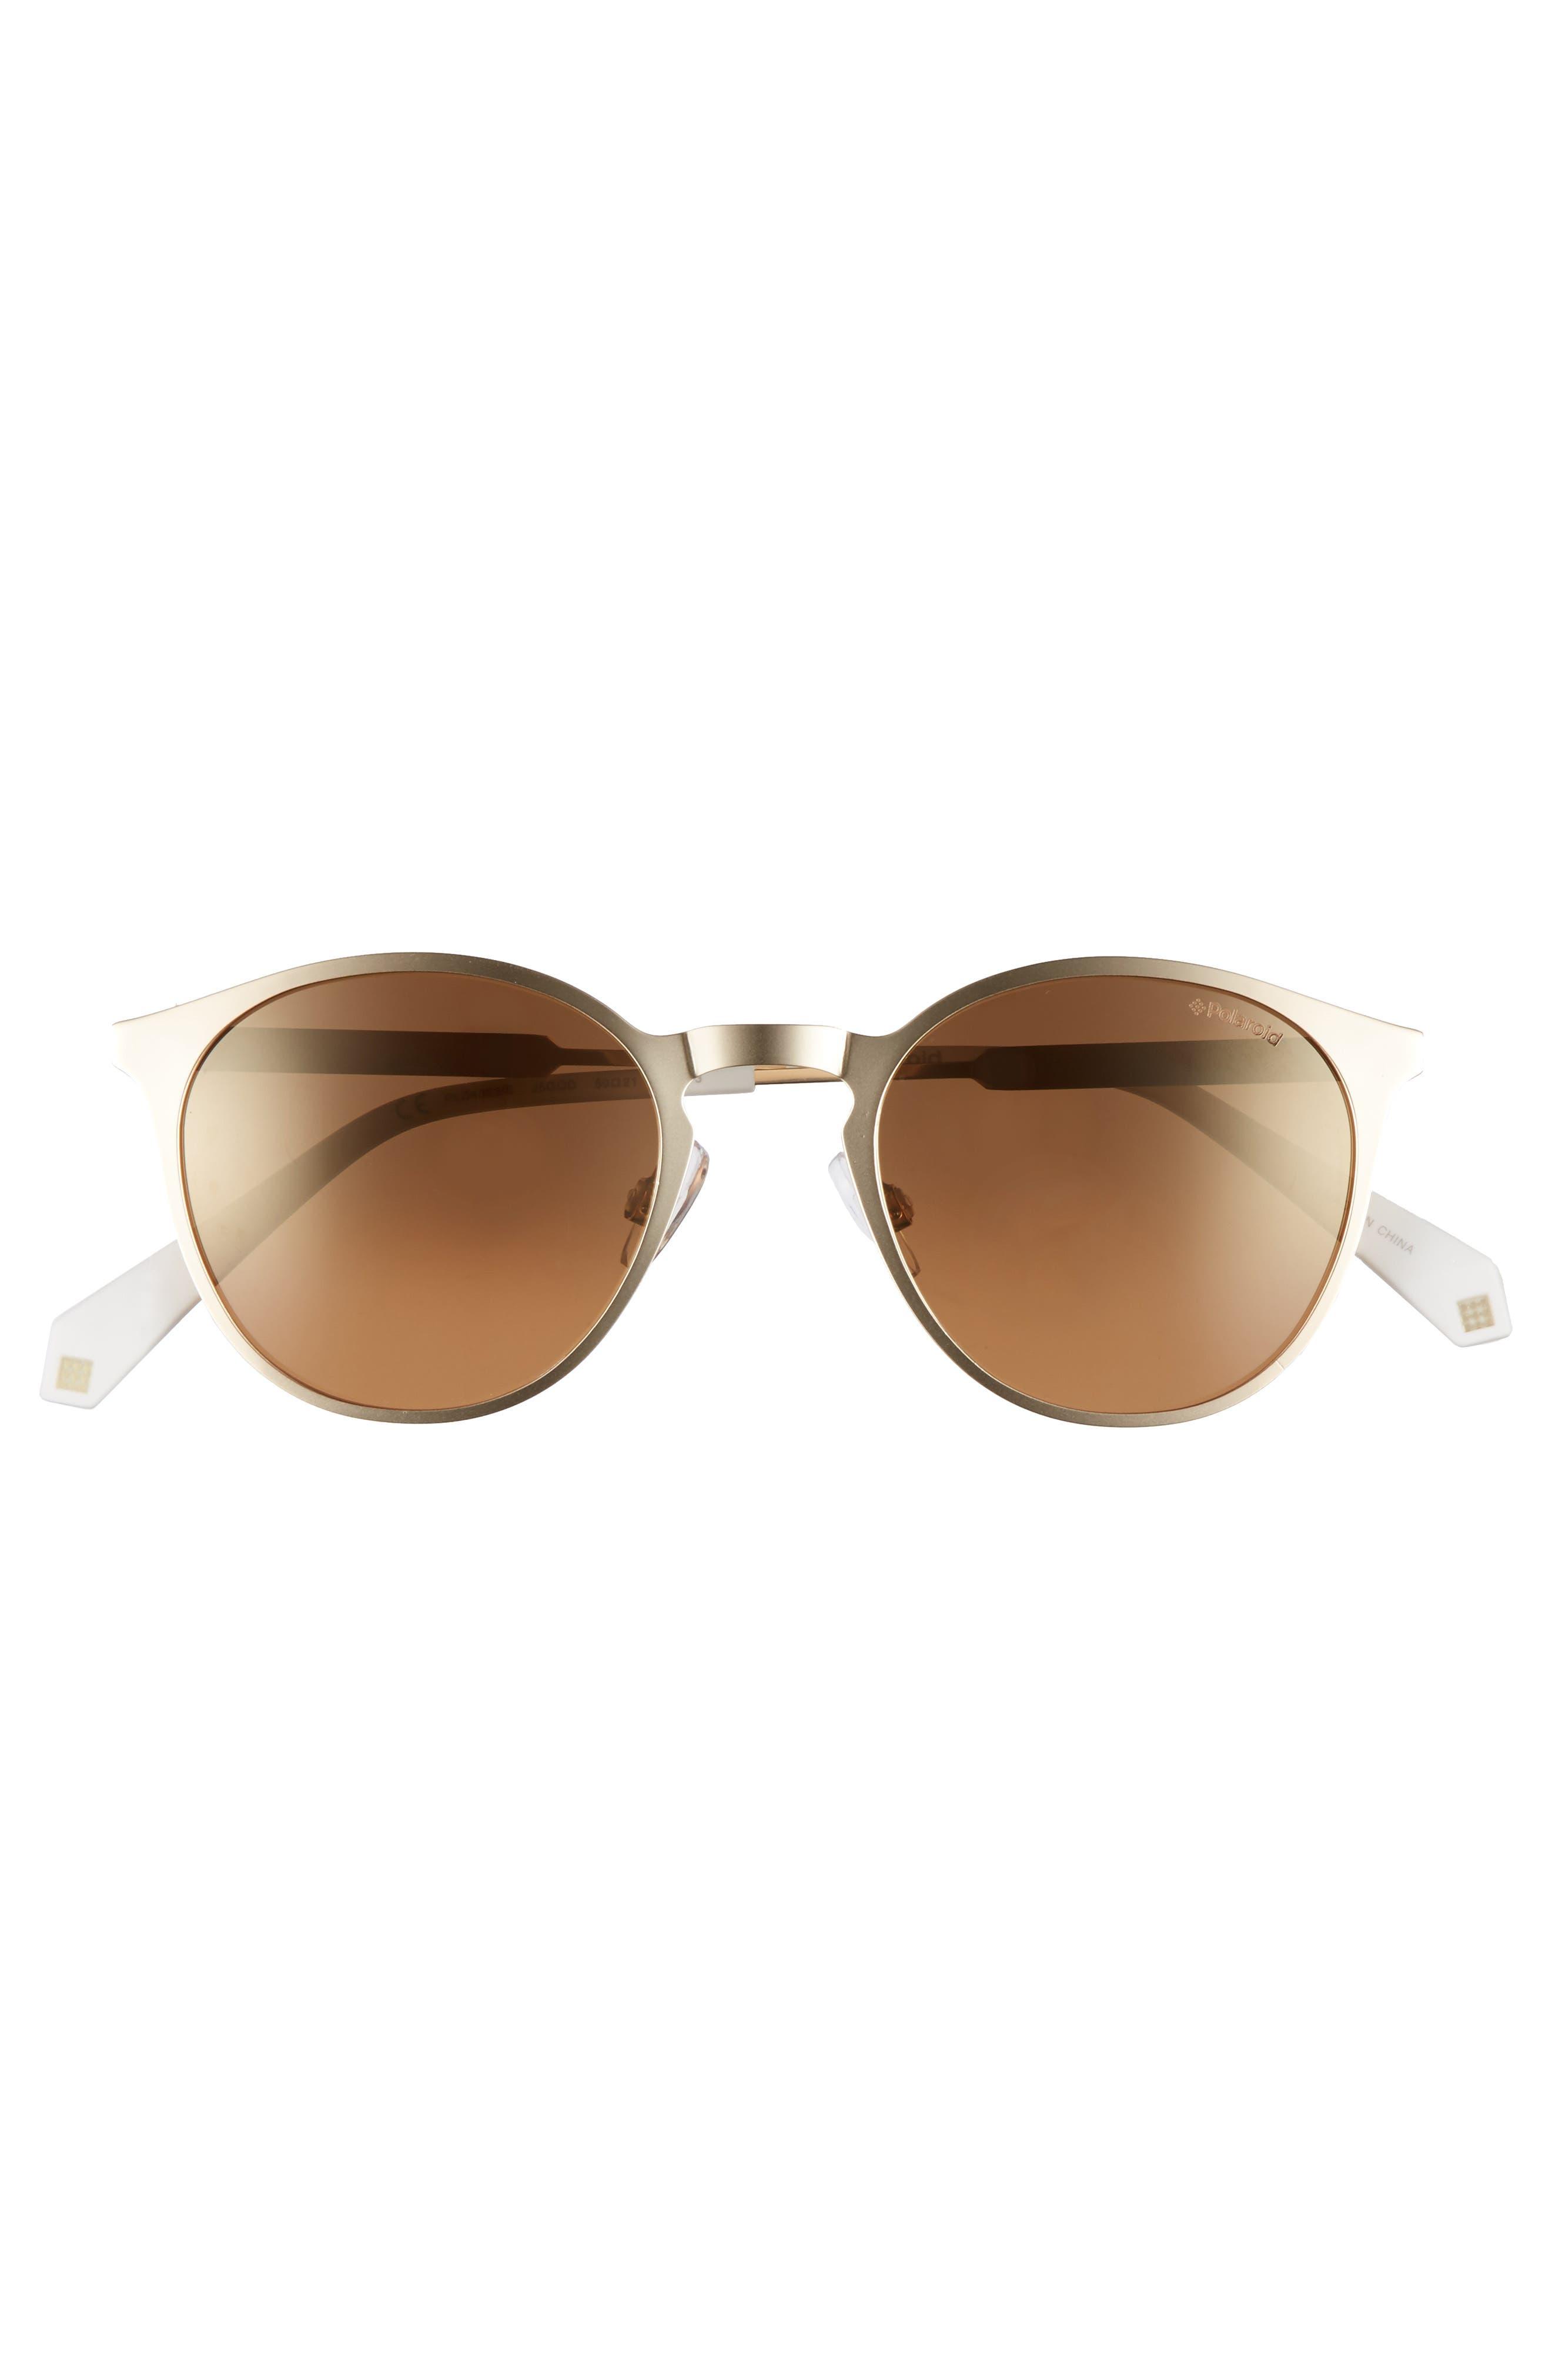 50mm Round Polarized Sunglasses,                             Alternate thumbnail 3, color,                             GOLD